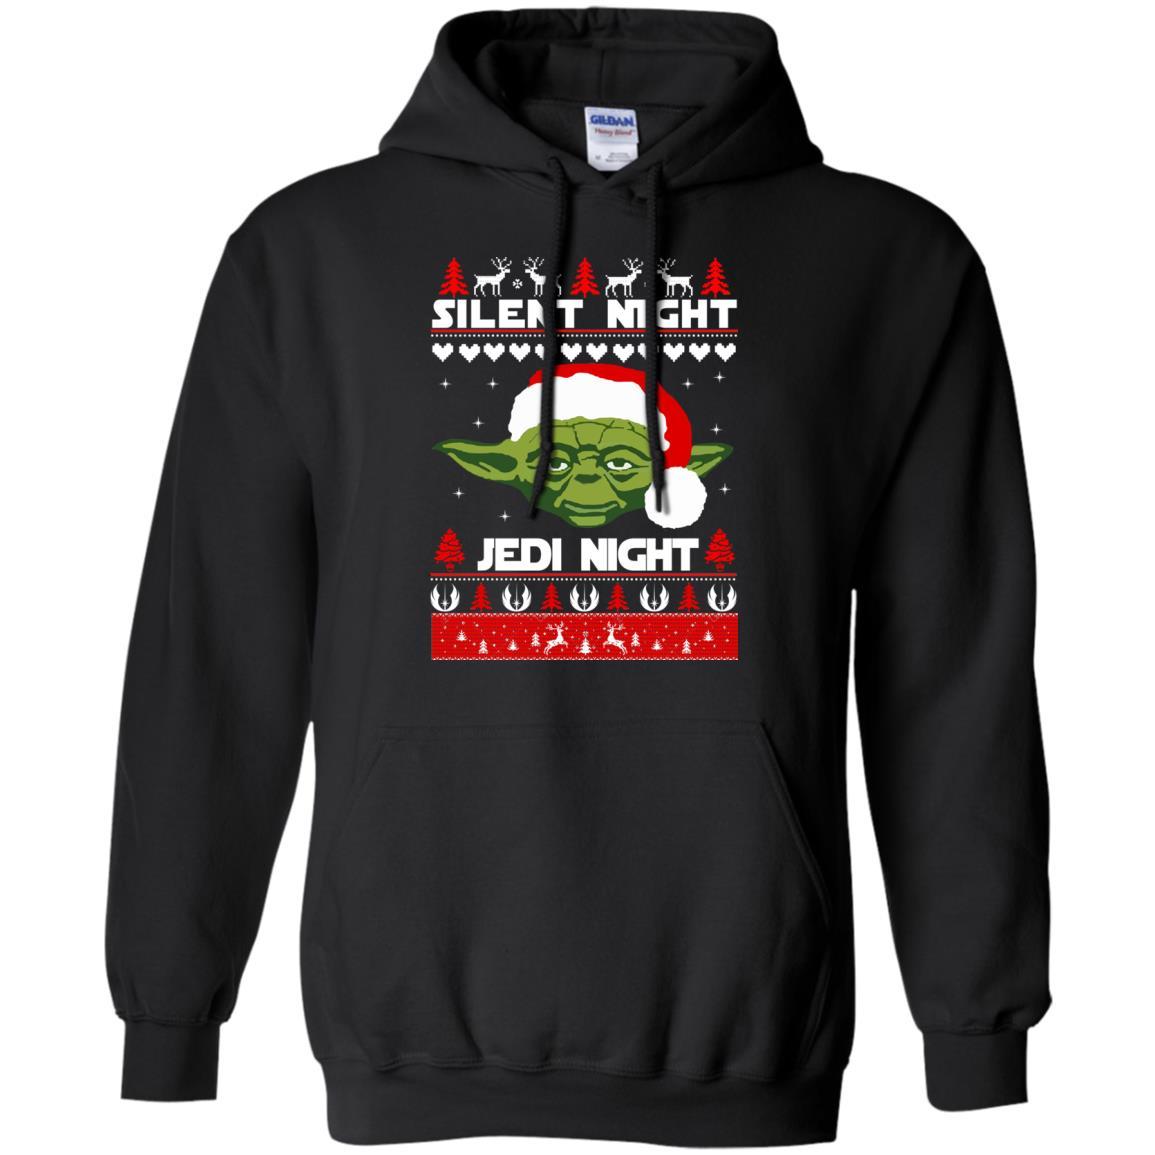 image 1714 - Yoda Star Wars: Silent Night Jedi Night Christmas Sweater, Hoodie